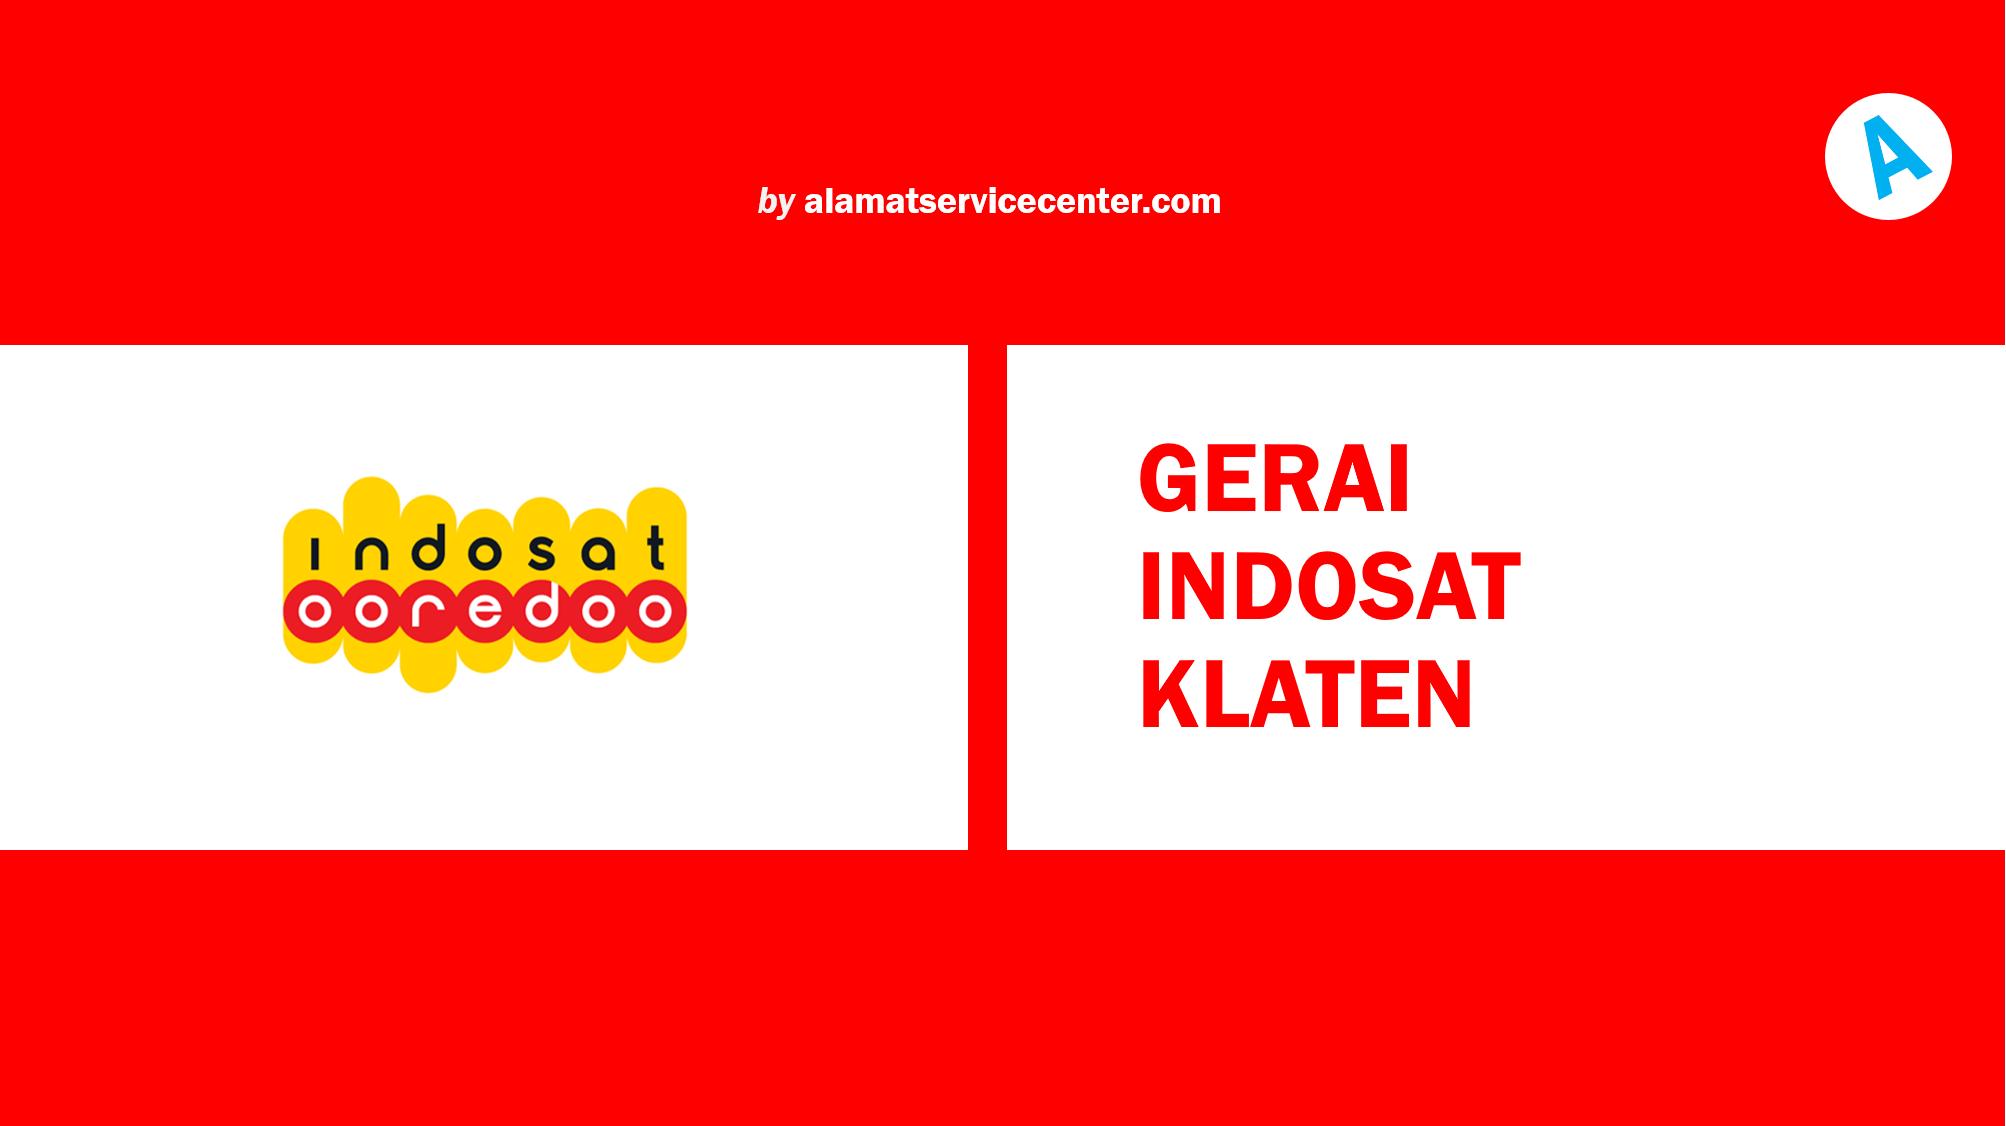 Gerai Indosat Klaten